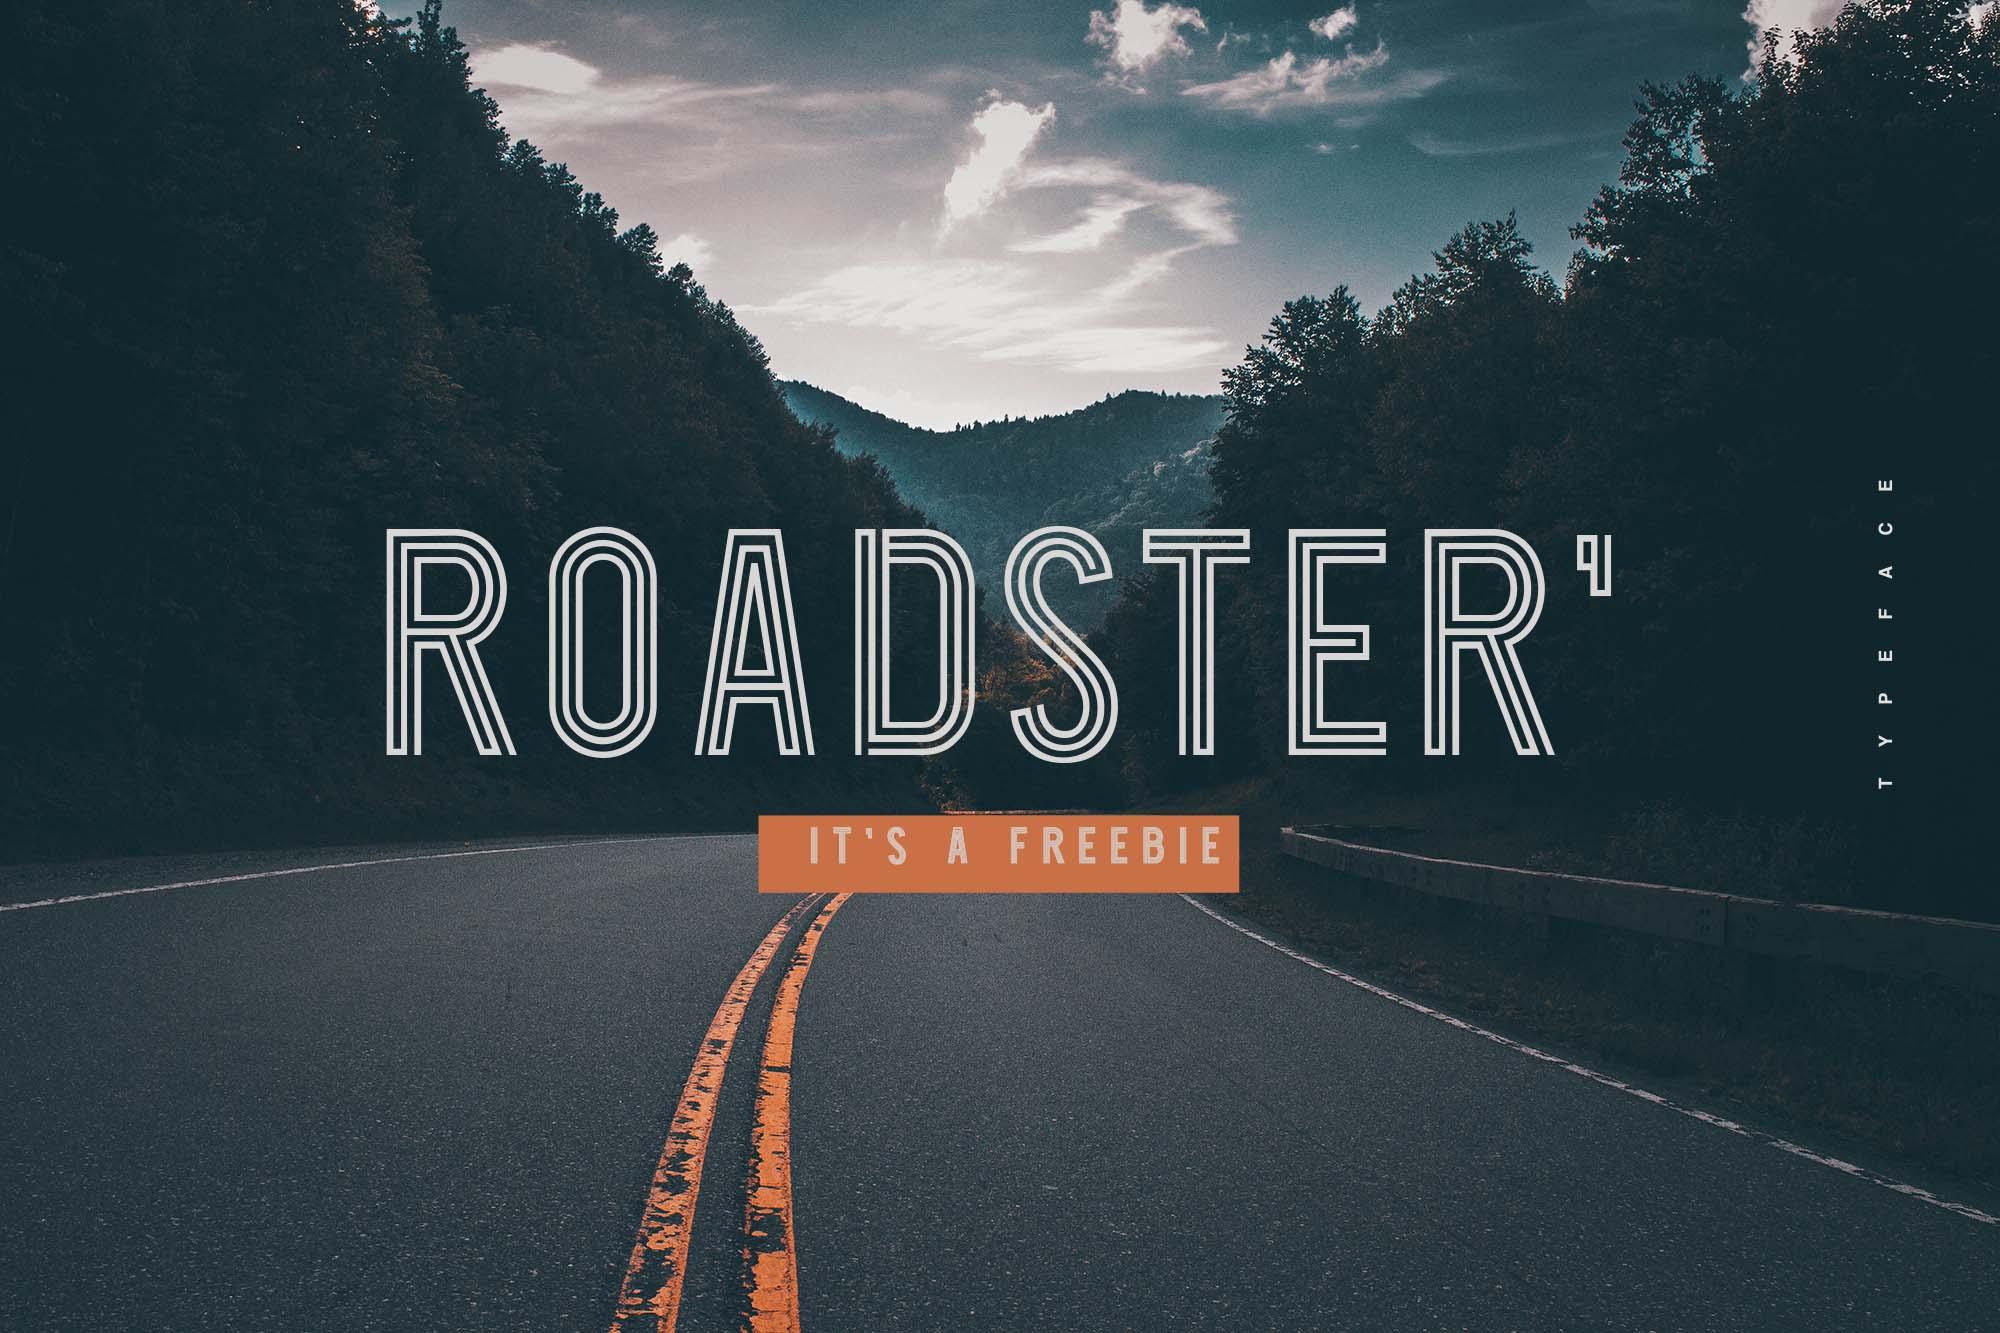 Roadster Display Free Font